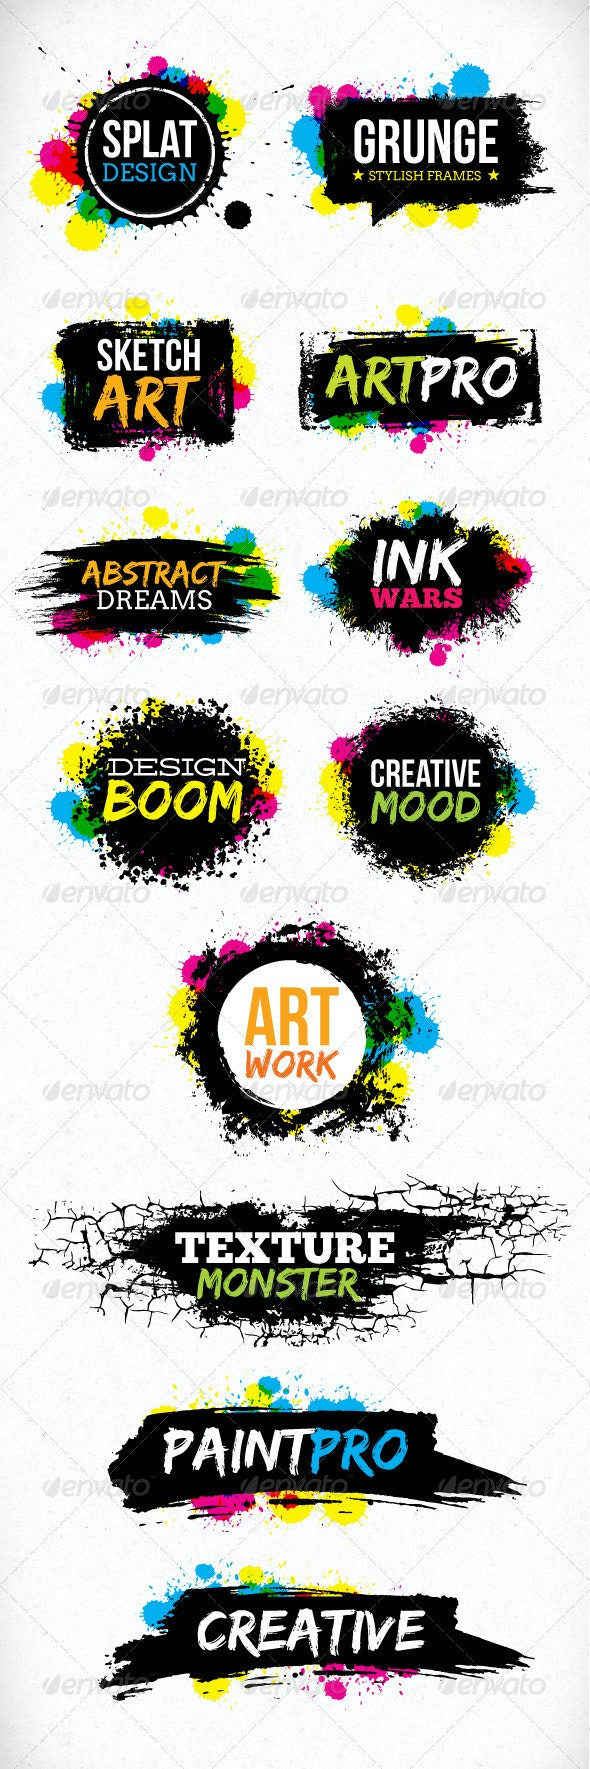 Grunge Blot Brush Vector Design Elements - Backgrounds Decorative